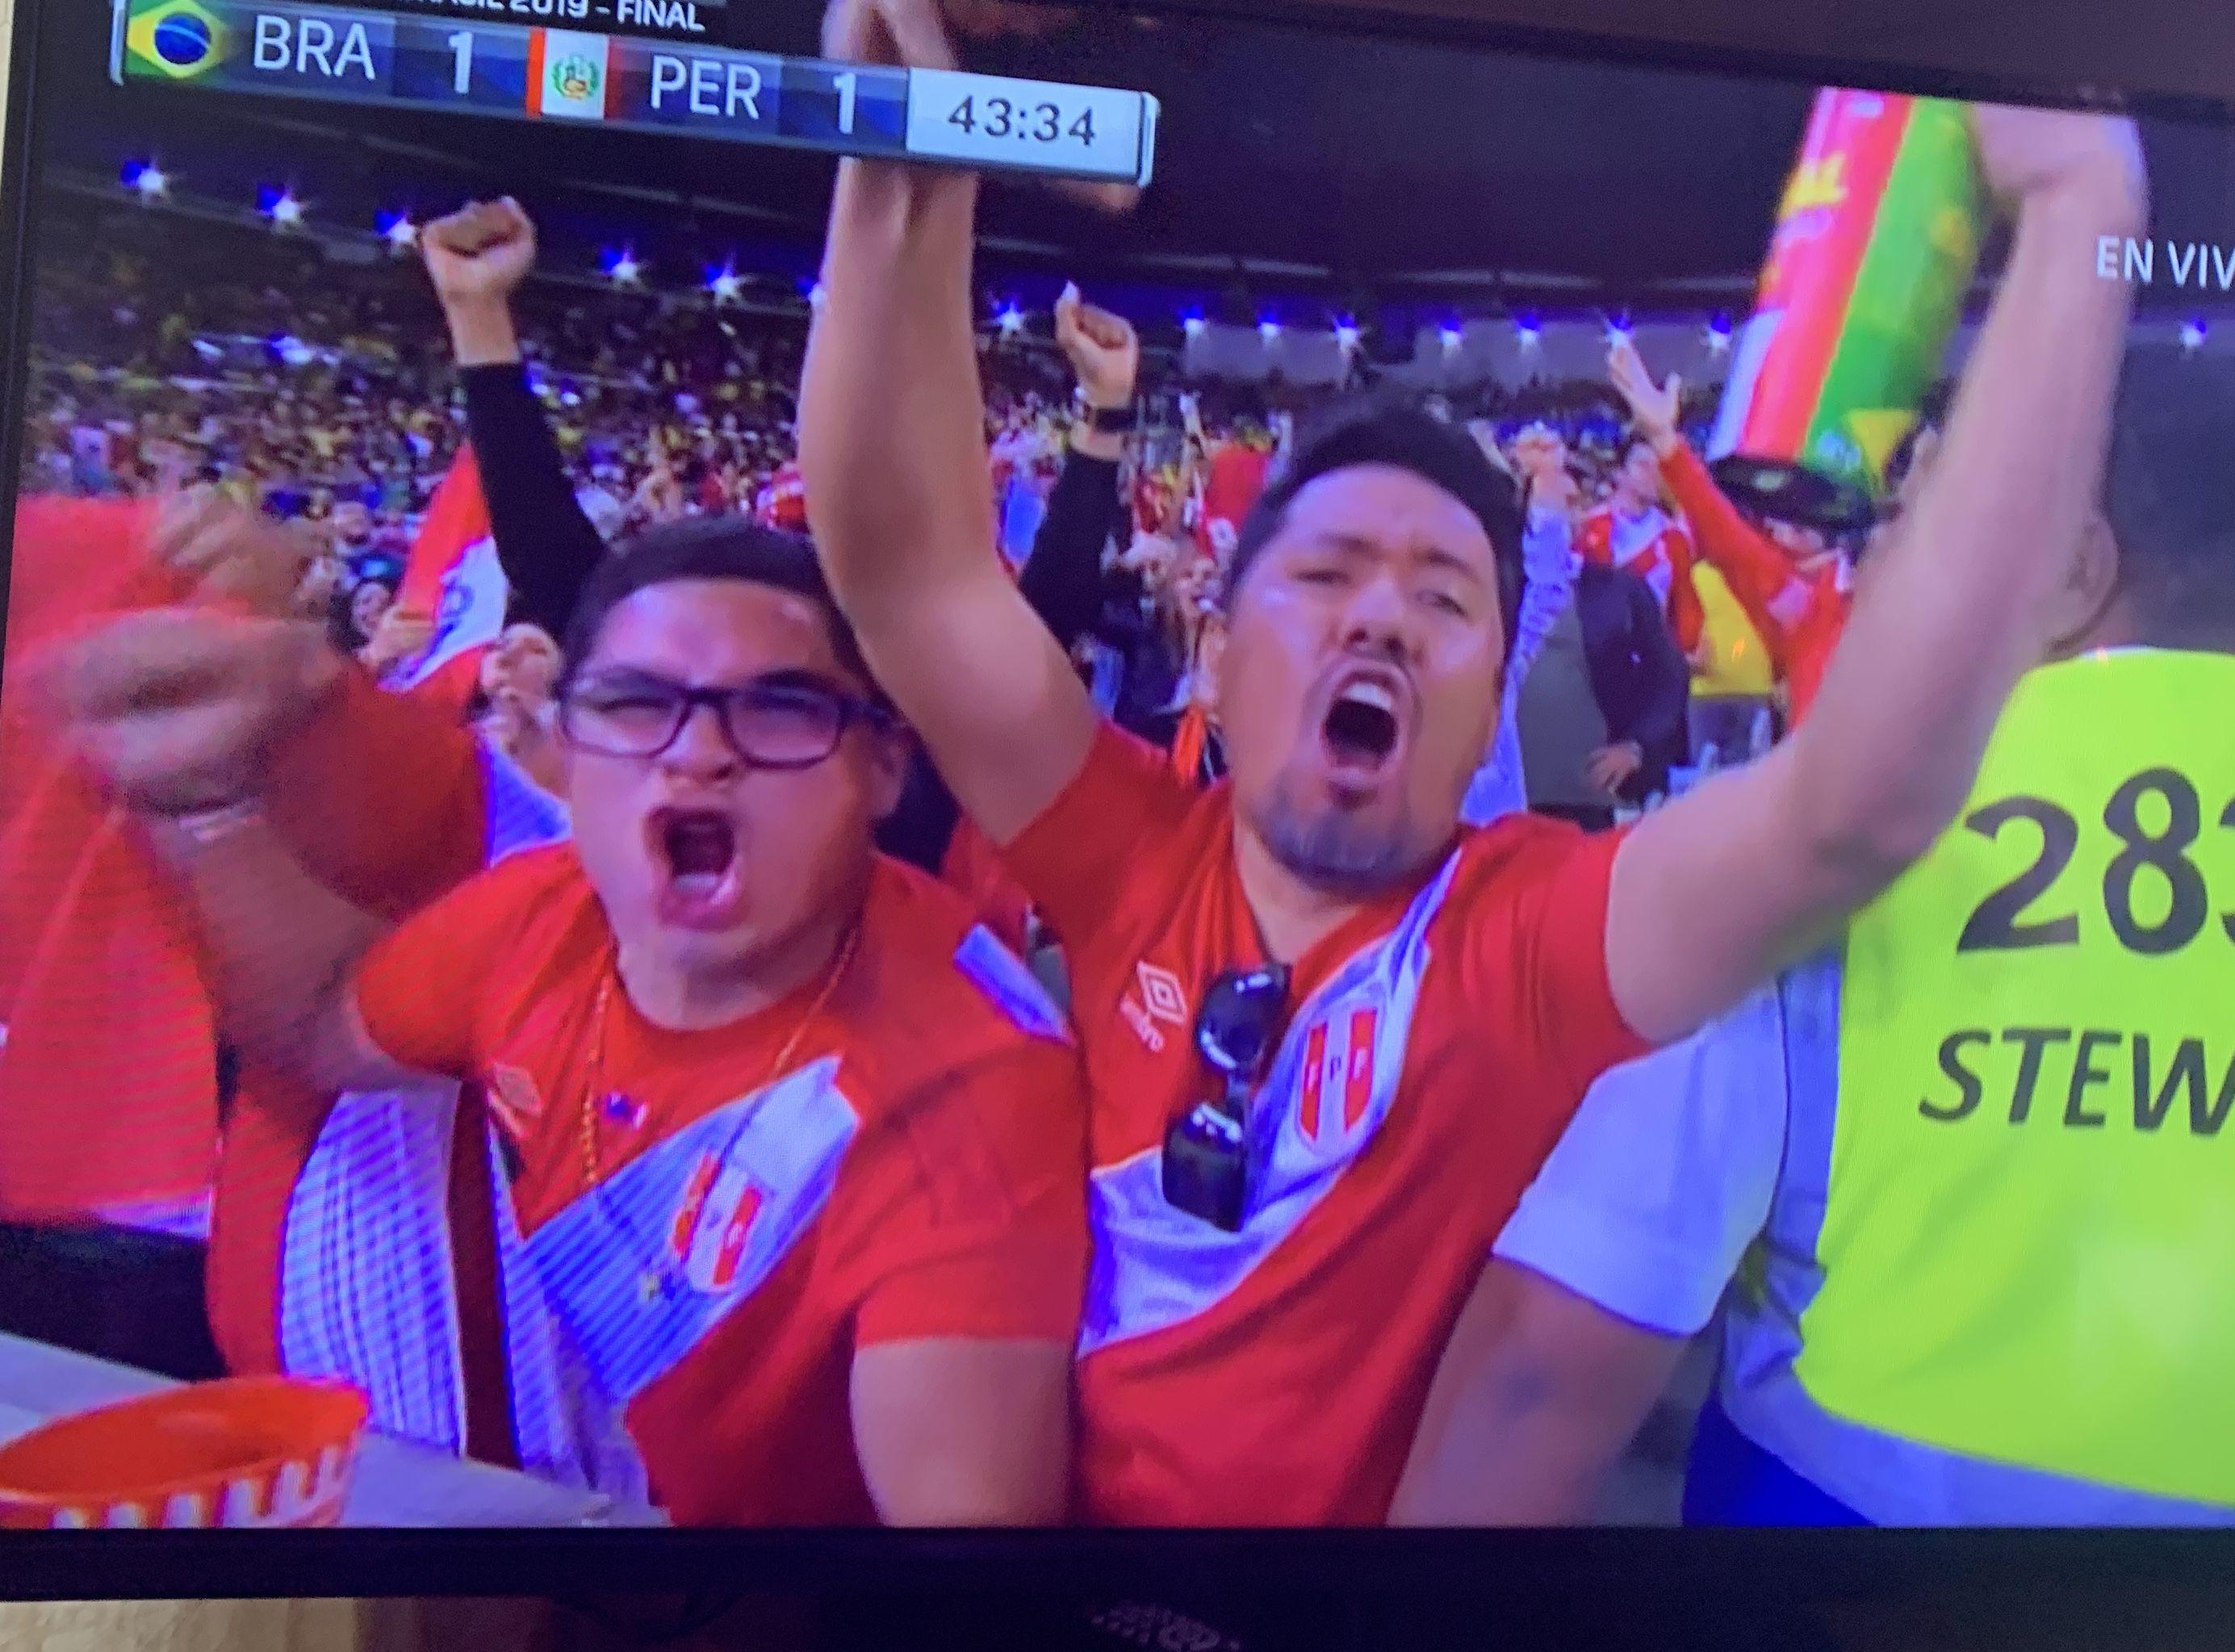 Copa América 2019 Bra, Sports jersey, Jersey